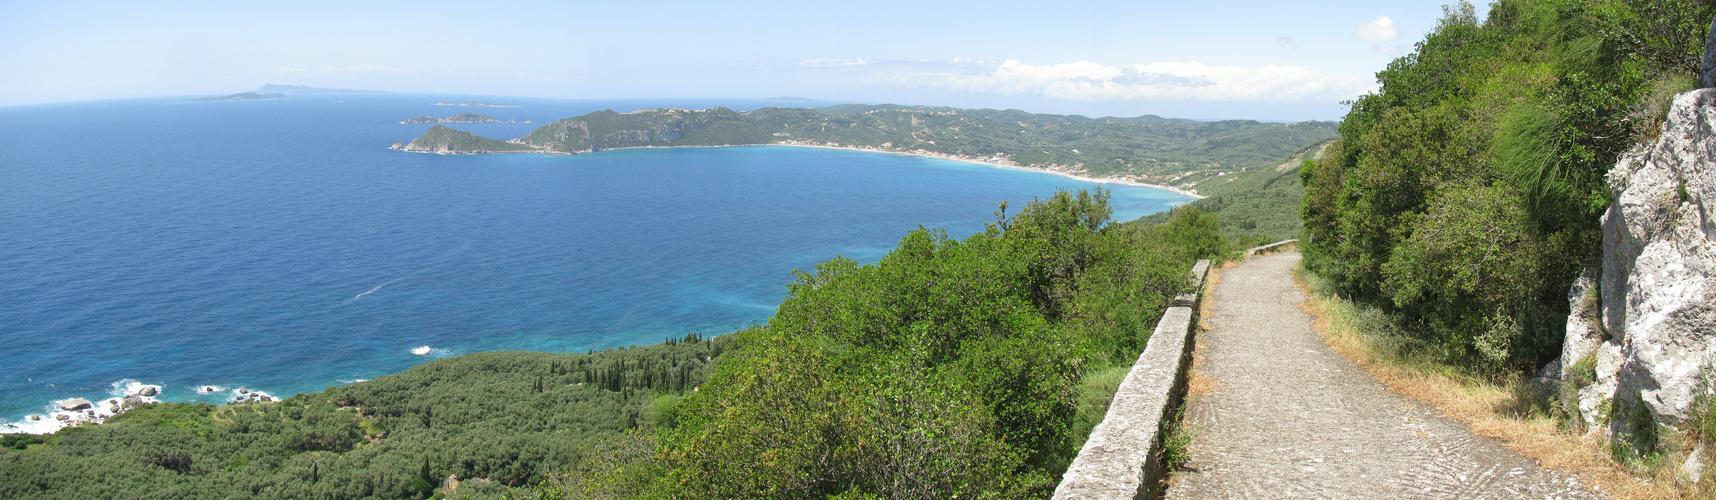 Römerweg - Korfu